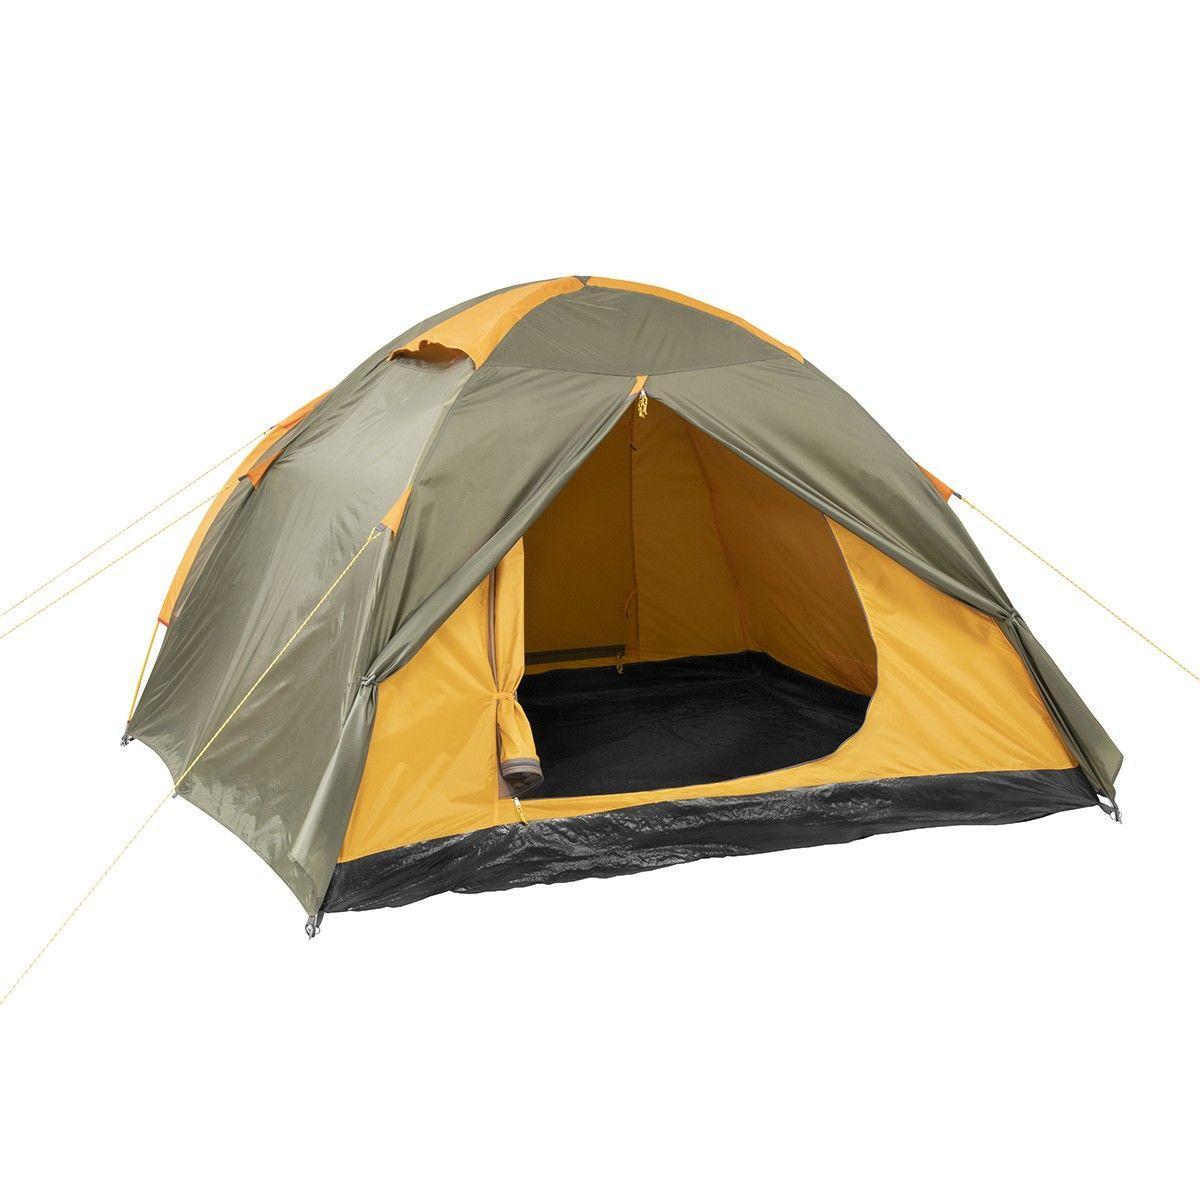 Палатка MUSSON-4 Helios зеленый-оранжевый HS-2366-4 GO - фото 4